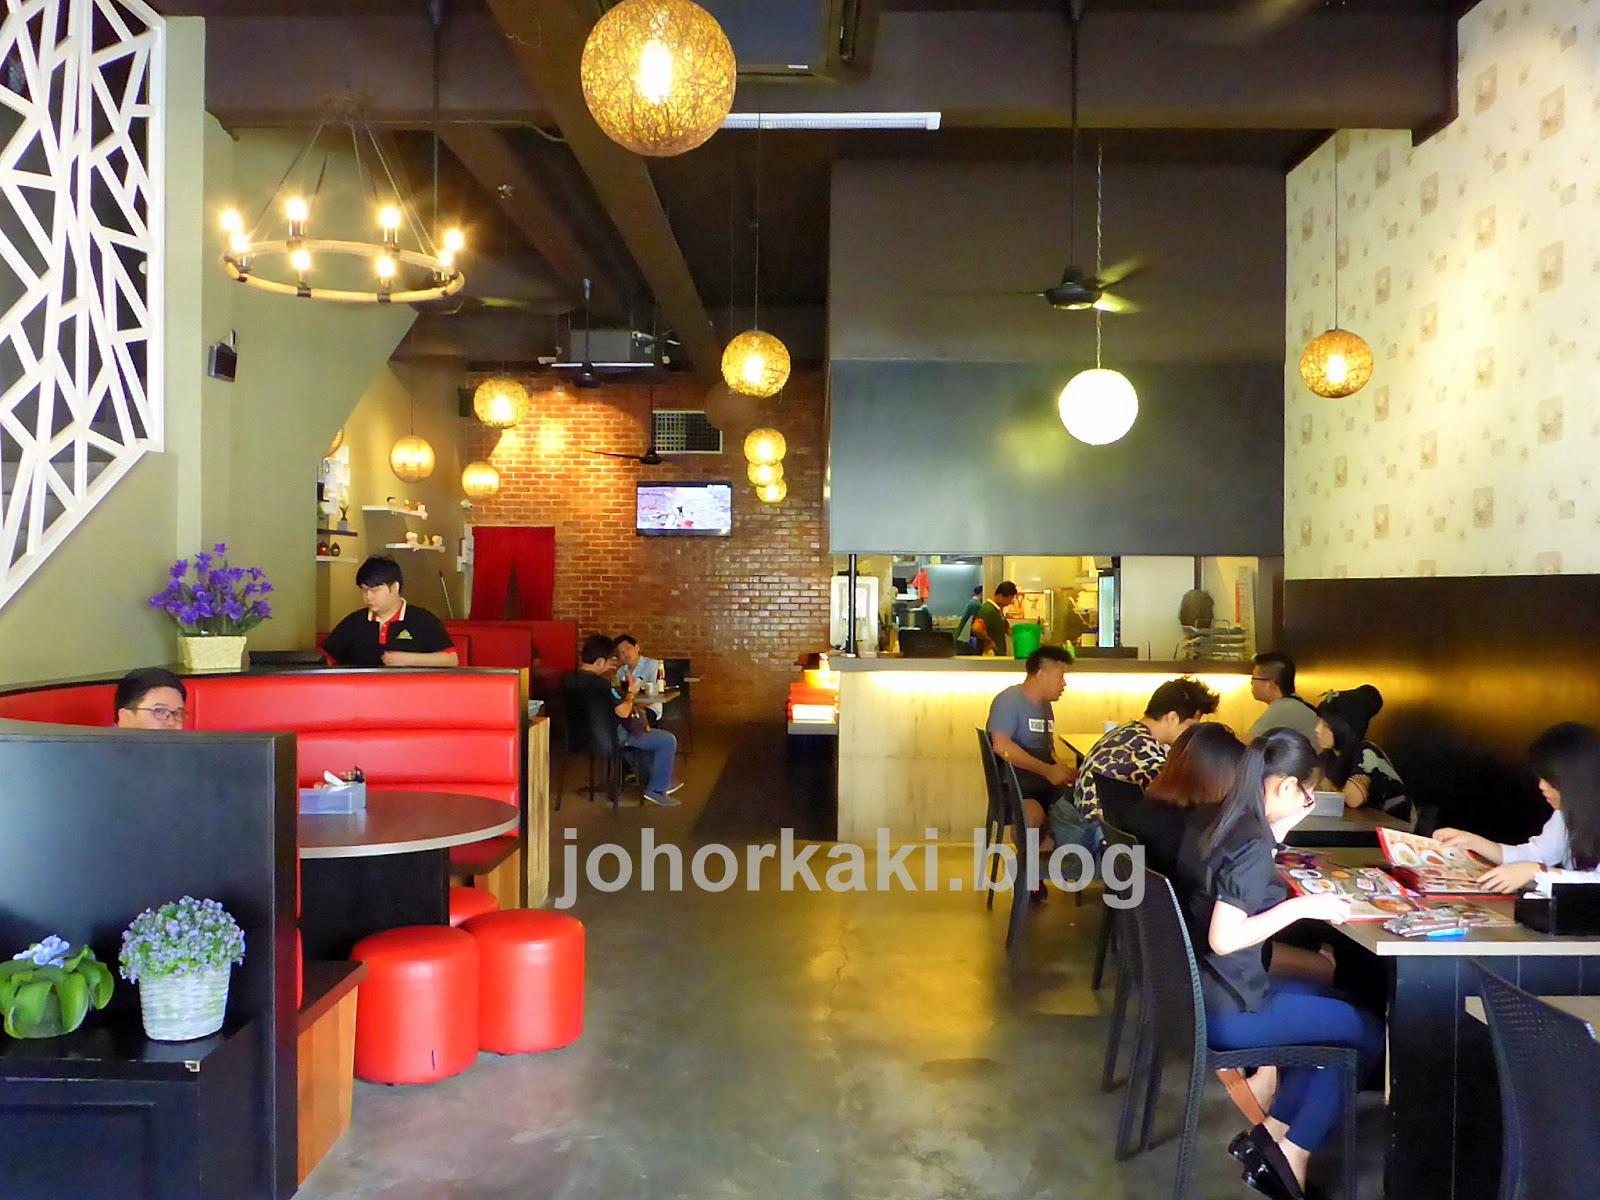 One two eat cafe at sutera utama johor bahru tony johor for Home decor johor bahru